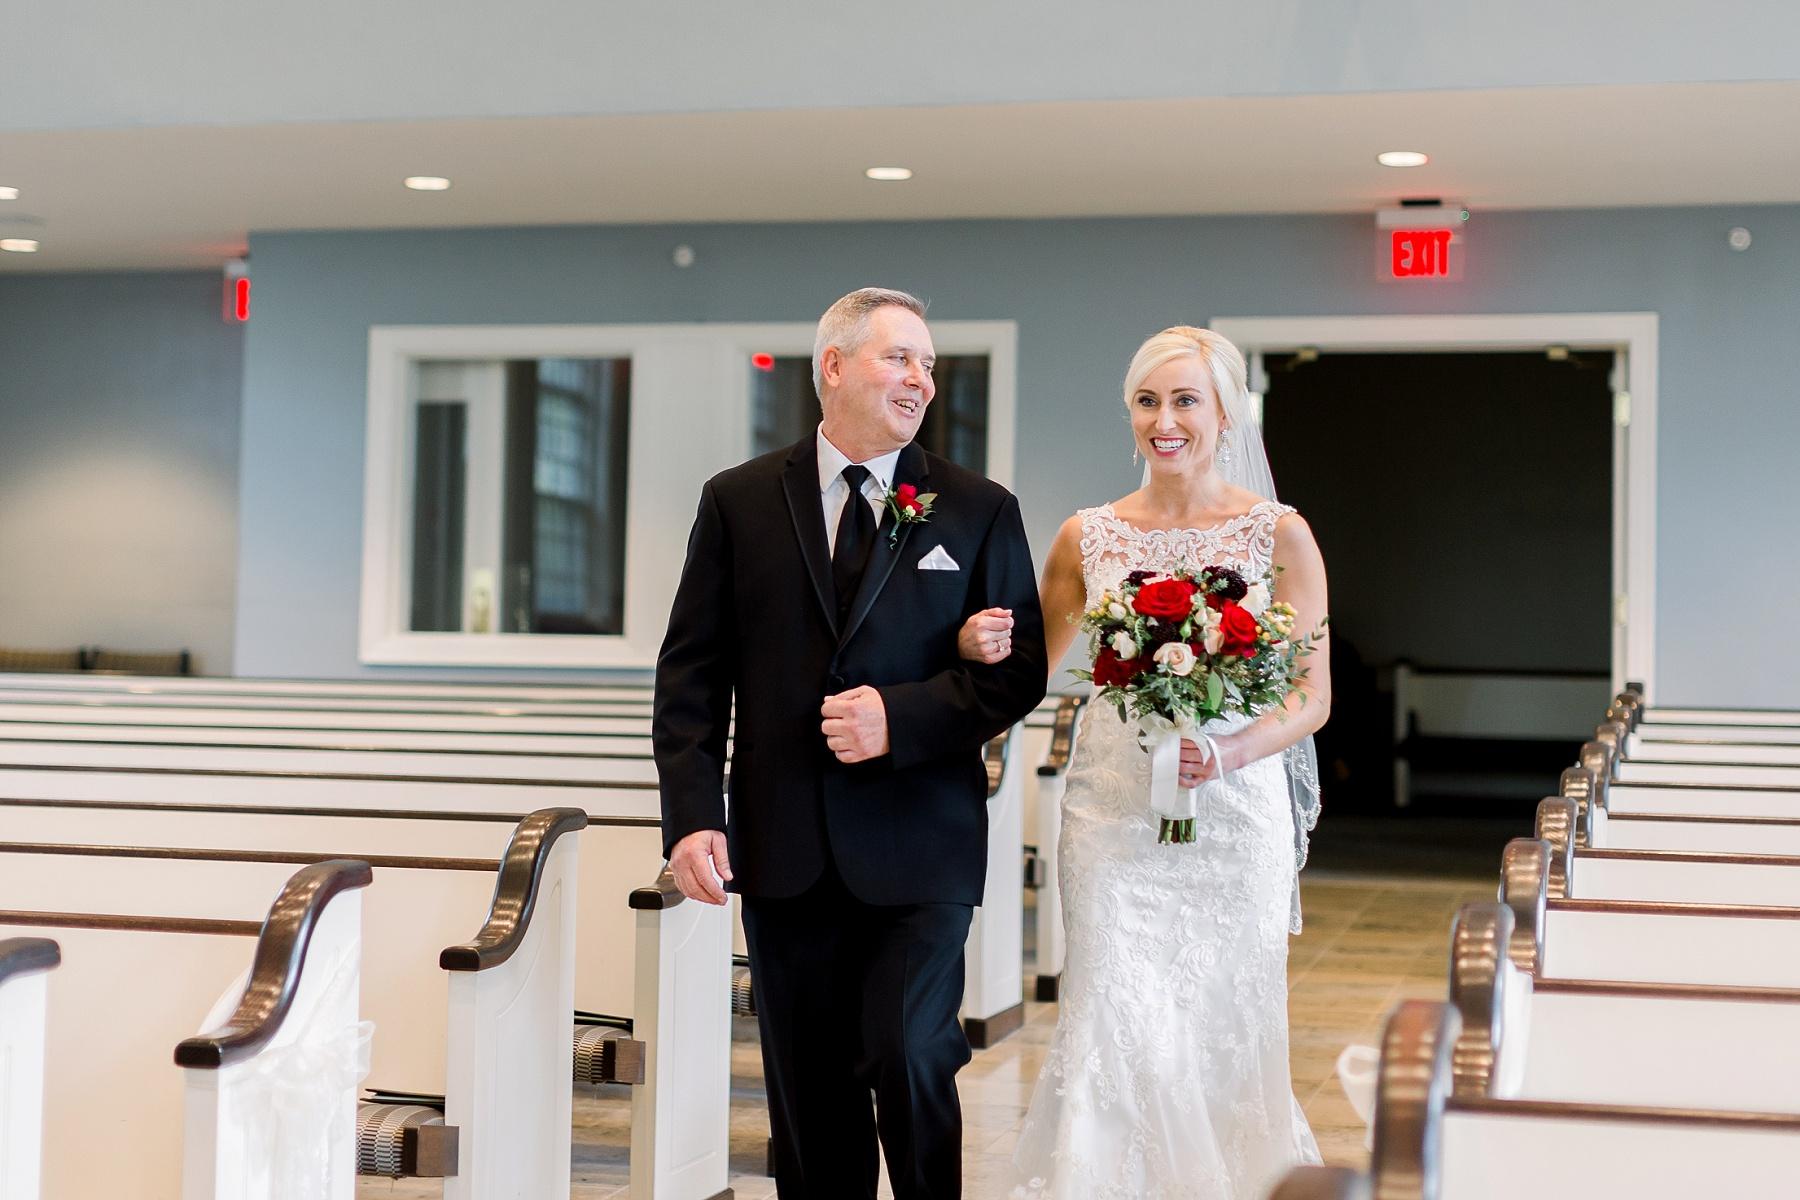 midwest-adventurous-wedding-photographer-elizabeth-ladean-photography-photo_4760.jpg